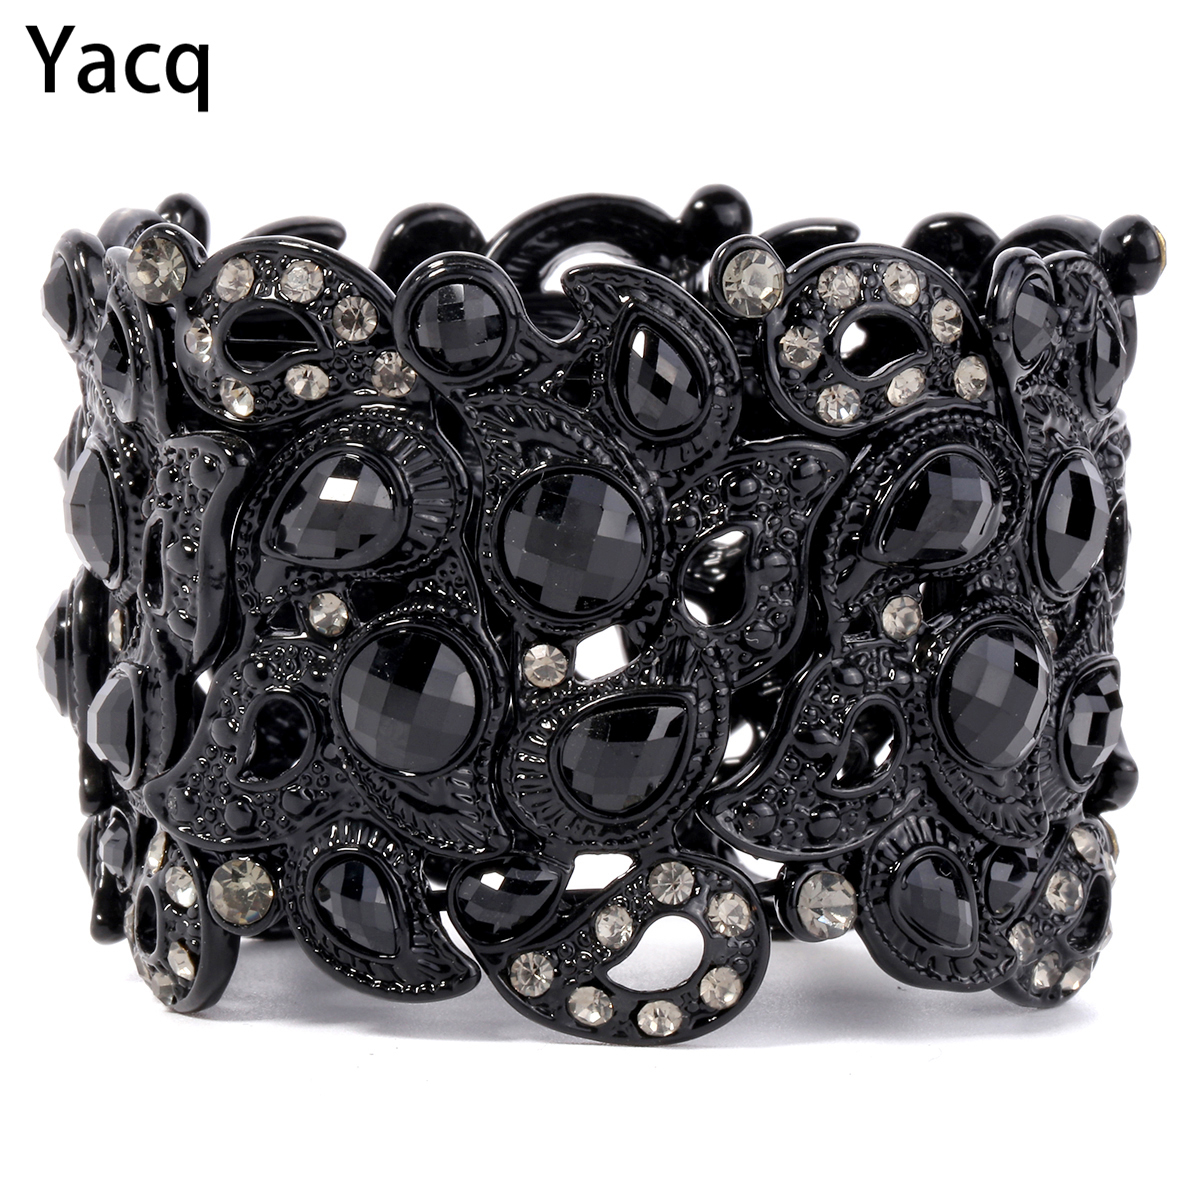 Yacq Stretch Bracelet Vintage Flower Crystal Women Fashion